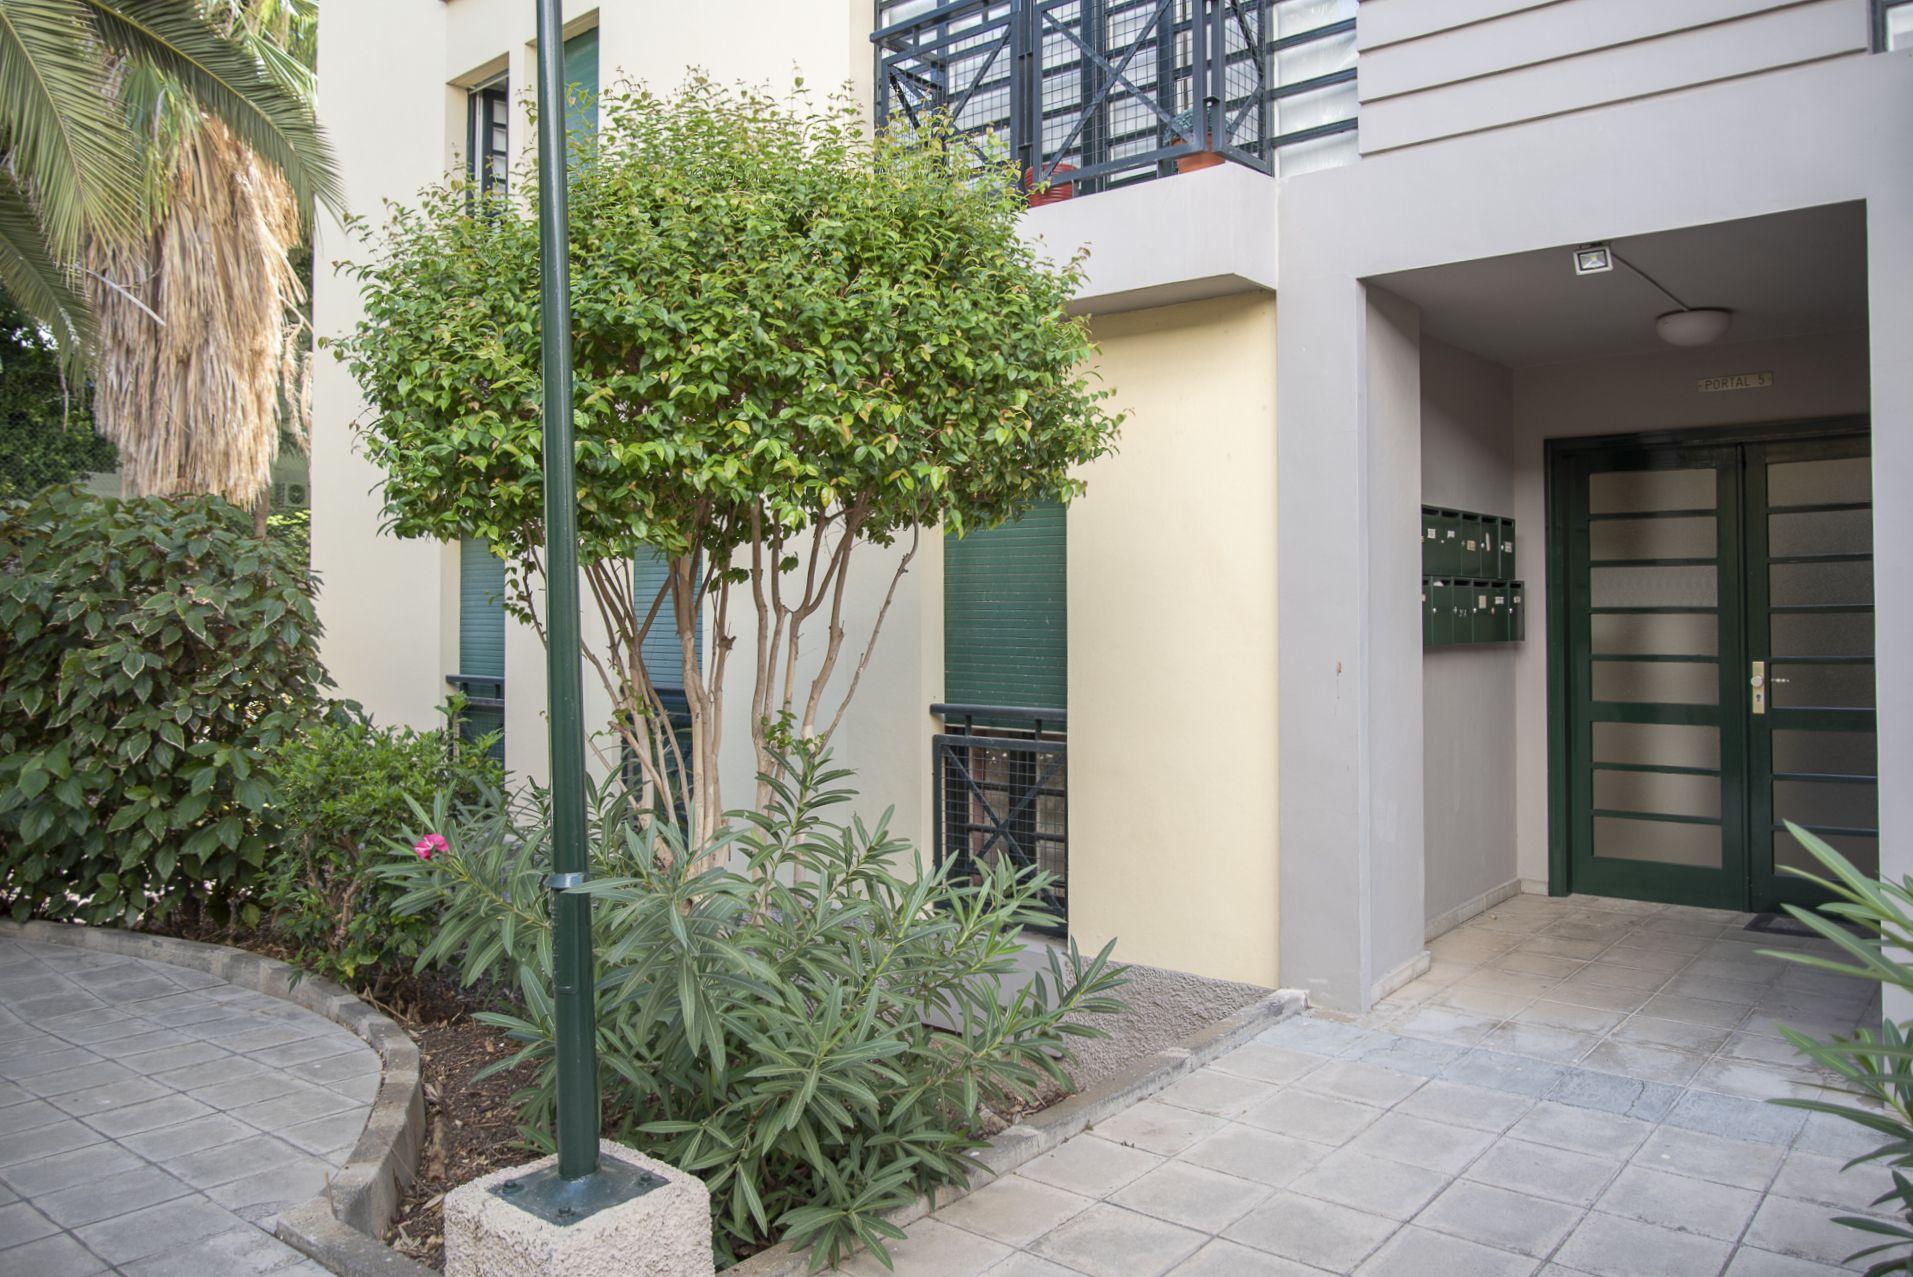 Club Oliver - Calle Salamanca - Entrada